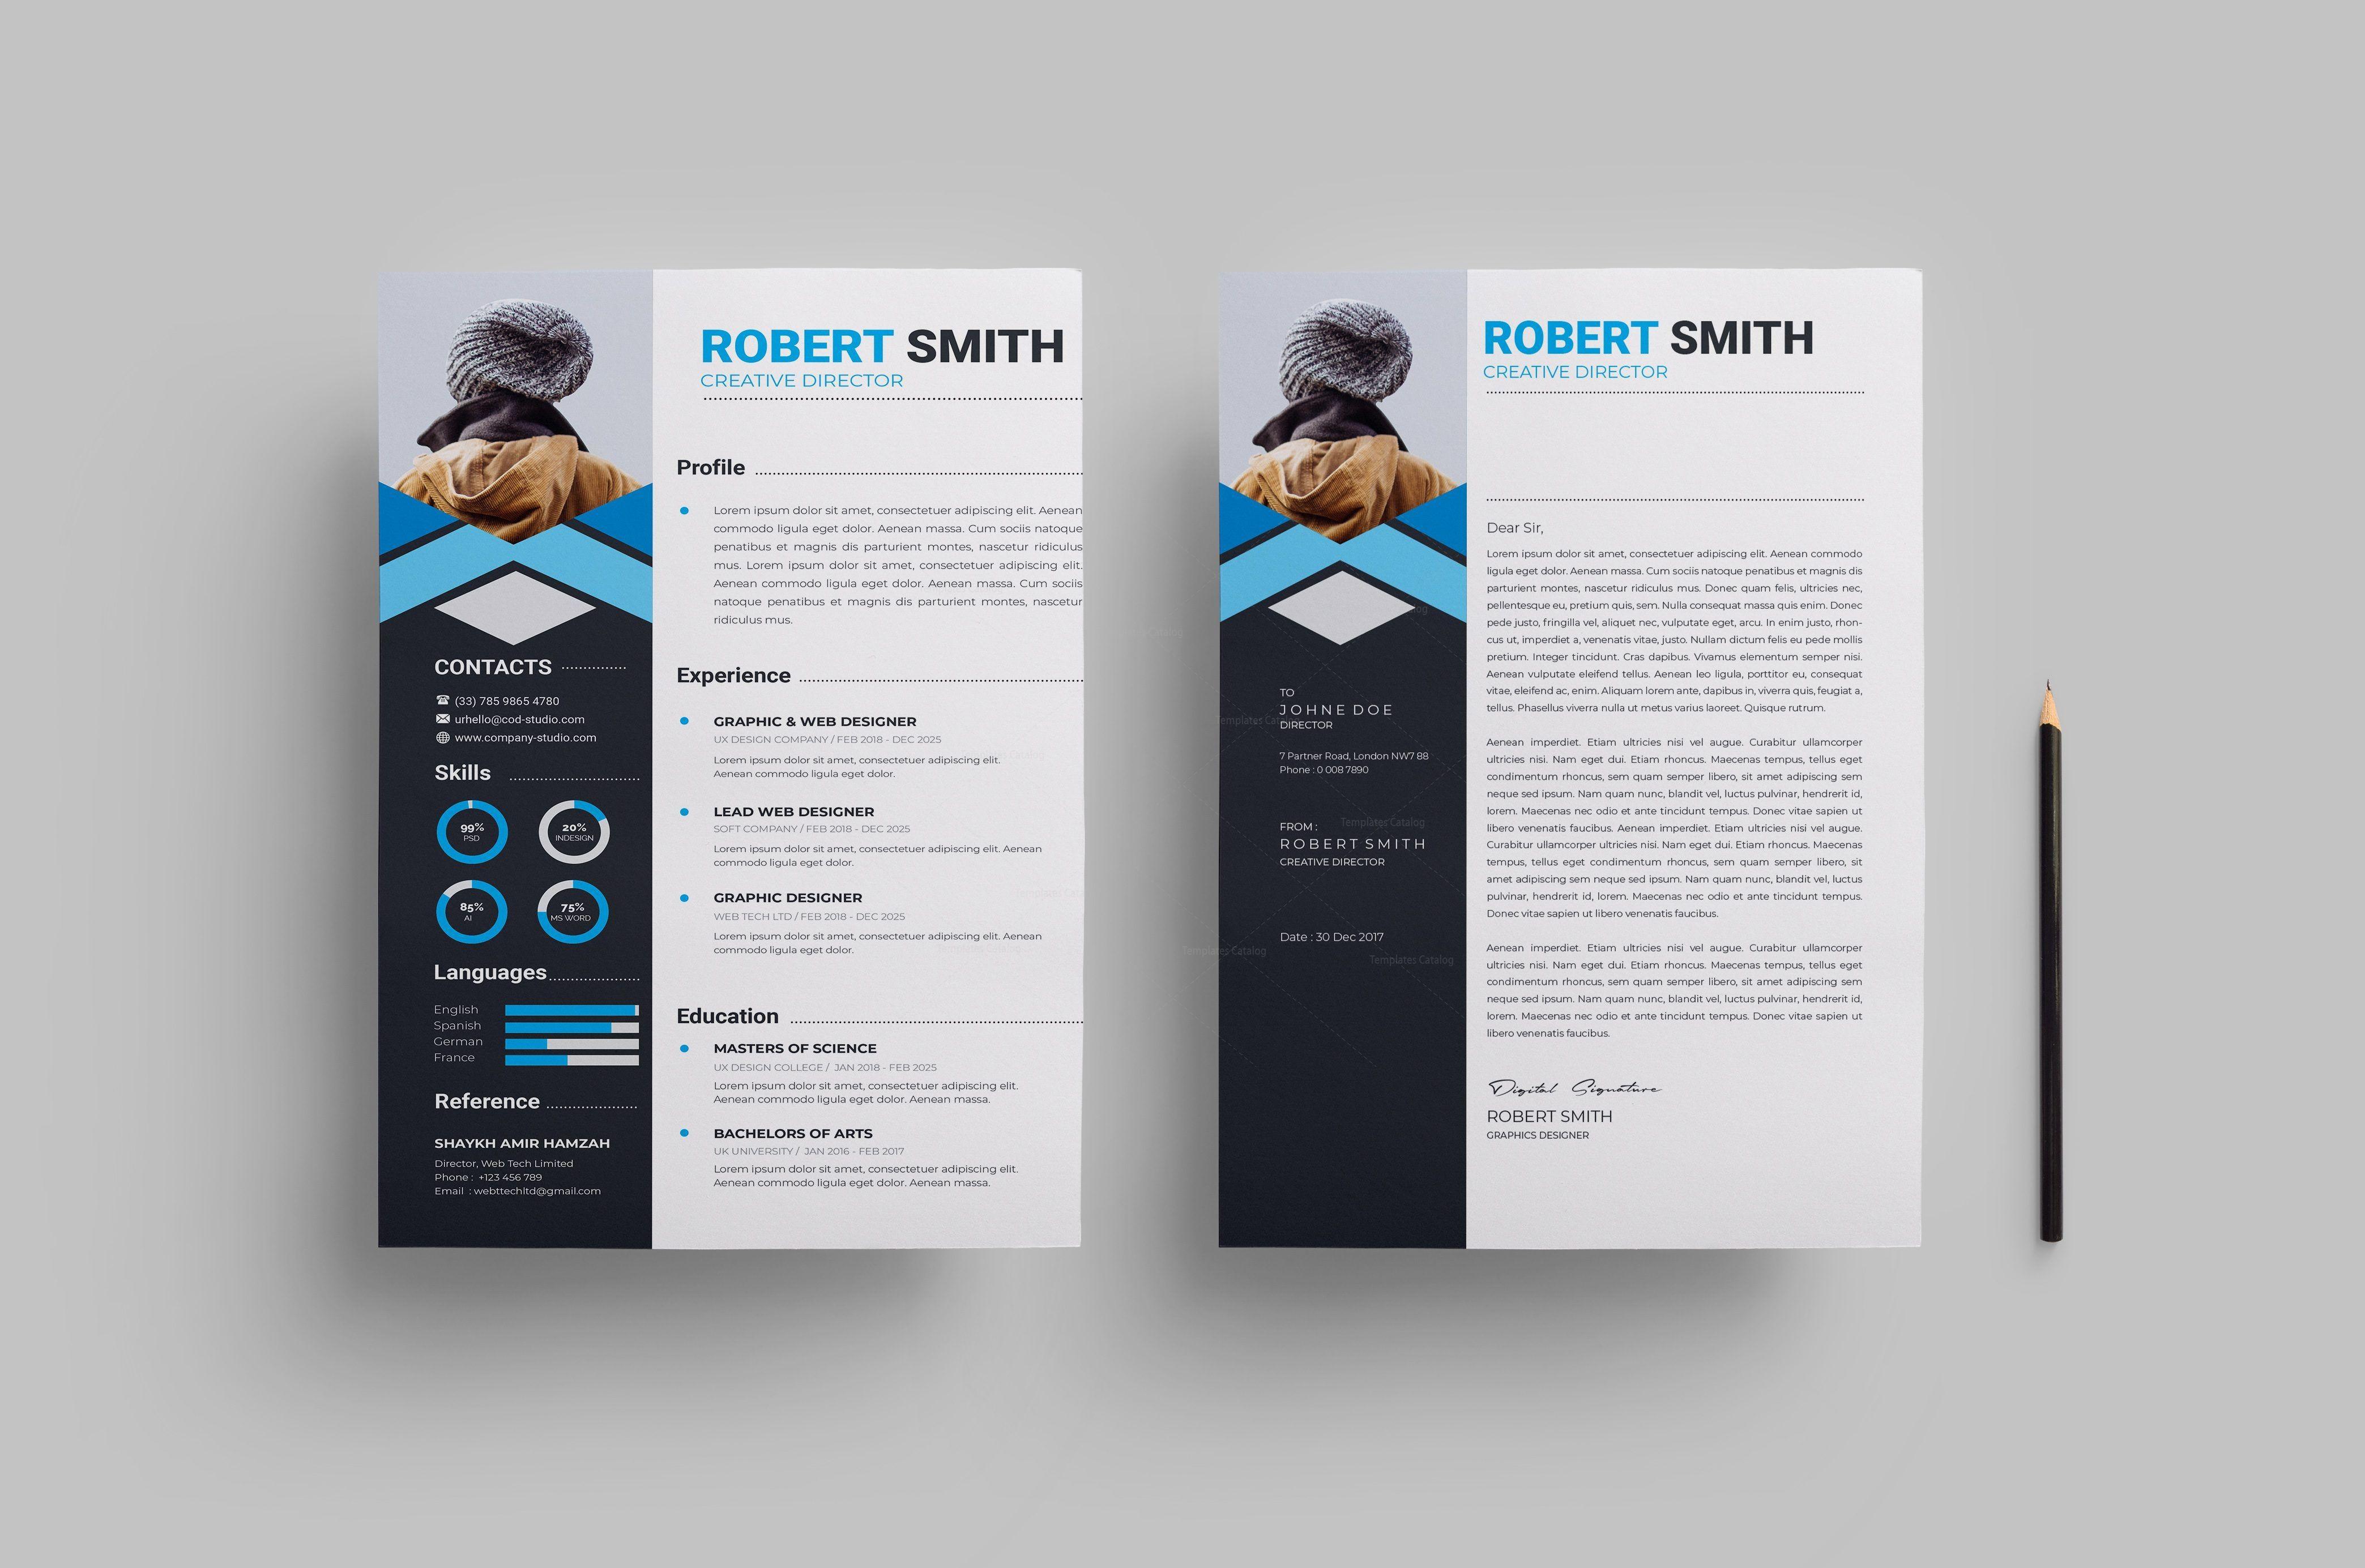 000 Wondrou Free Stylish Resume Template Photo  Templates Word DownloadFull